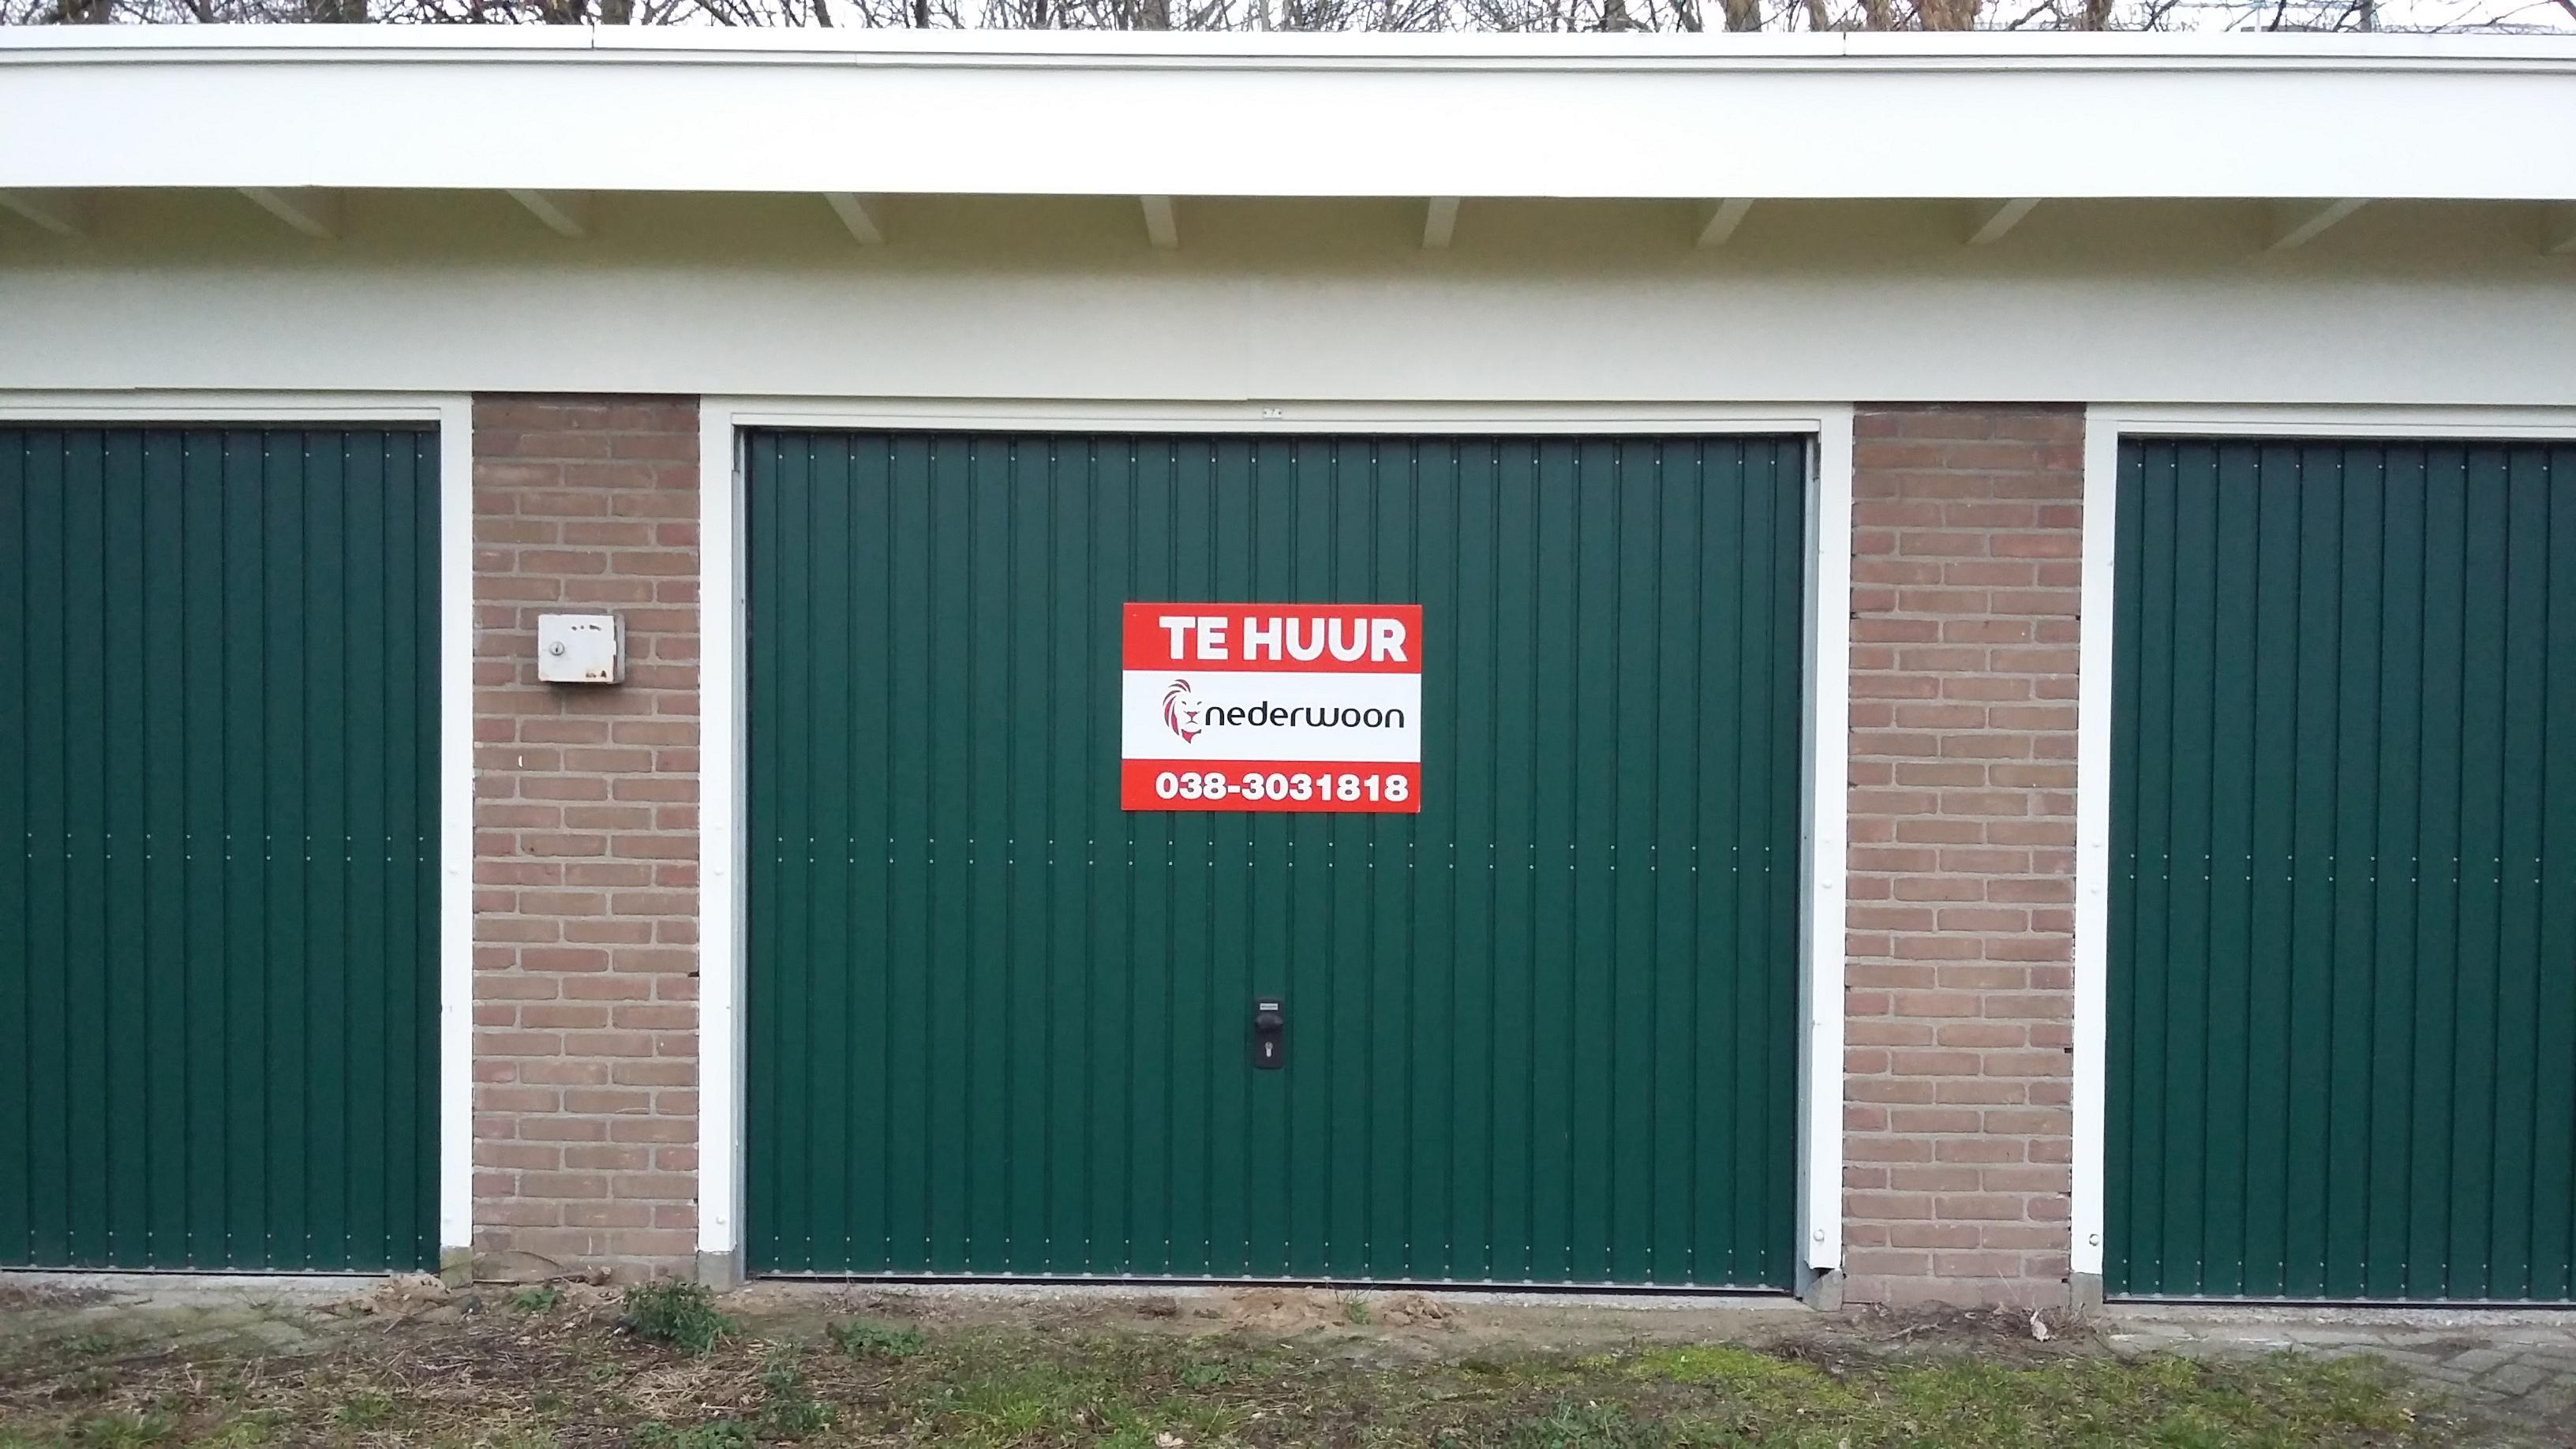 Garage Huren Utrecht : Garagebox prof feldmannweg te huur in zwolle nederwoon